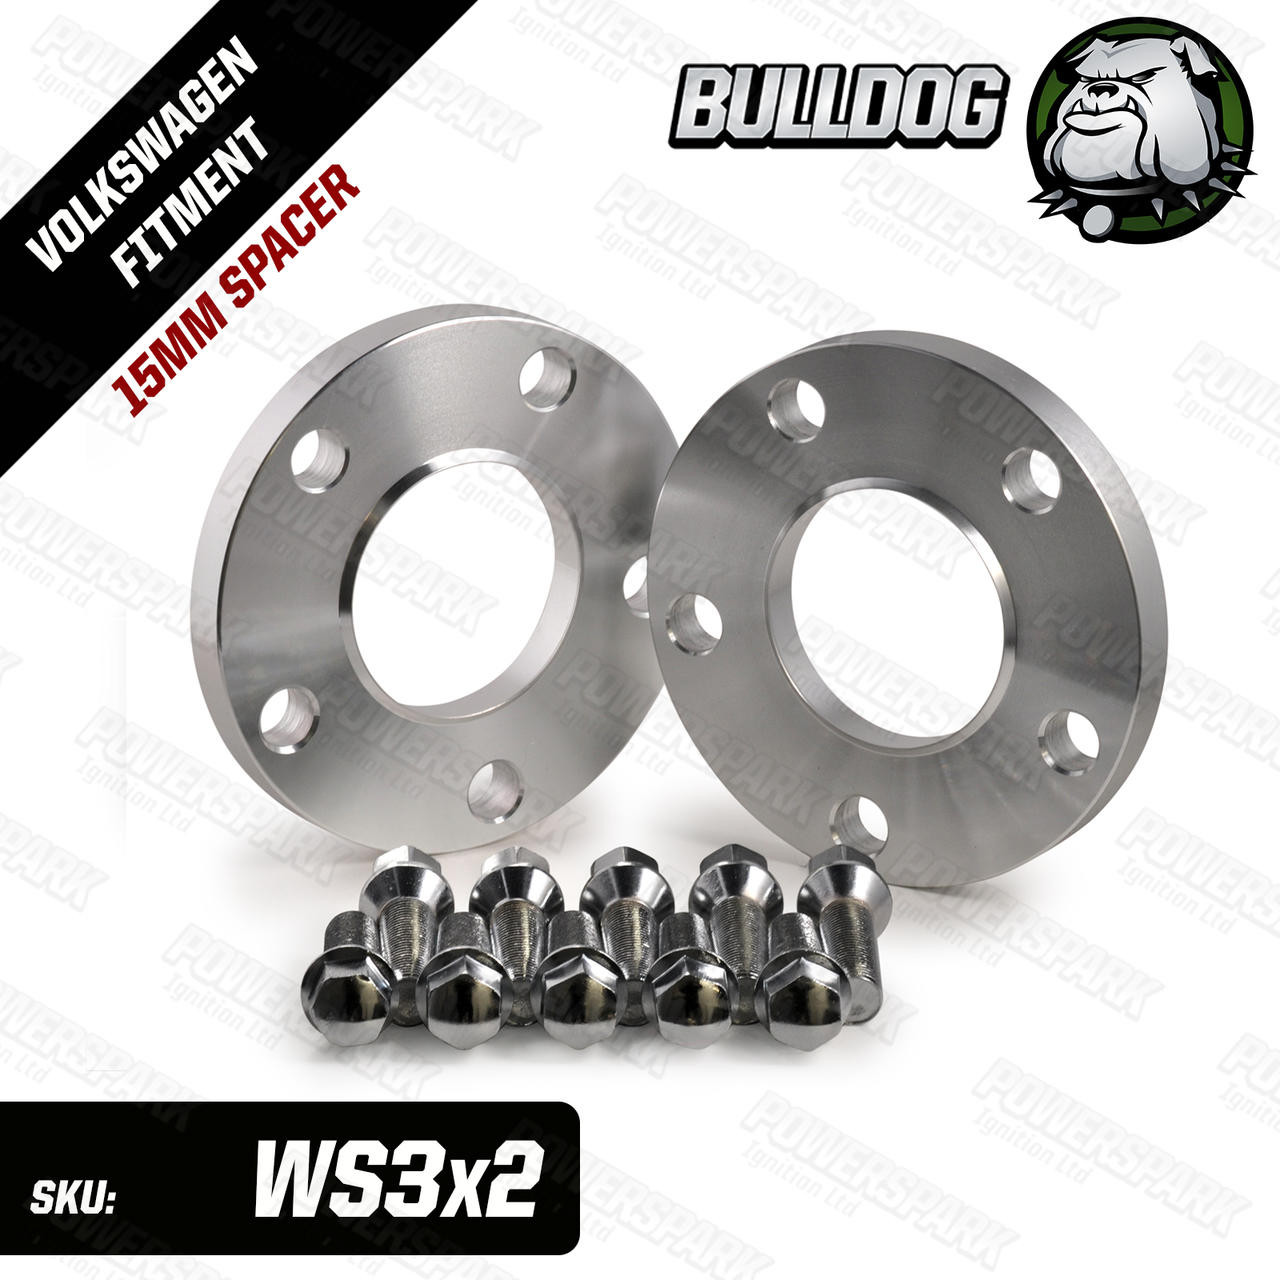 Bulldog Set of 2 Bulldog 15mm Wheel Spacers to suit Volkswagen, Audi, Skoda, Seat 5x112 PCD Wheels